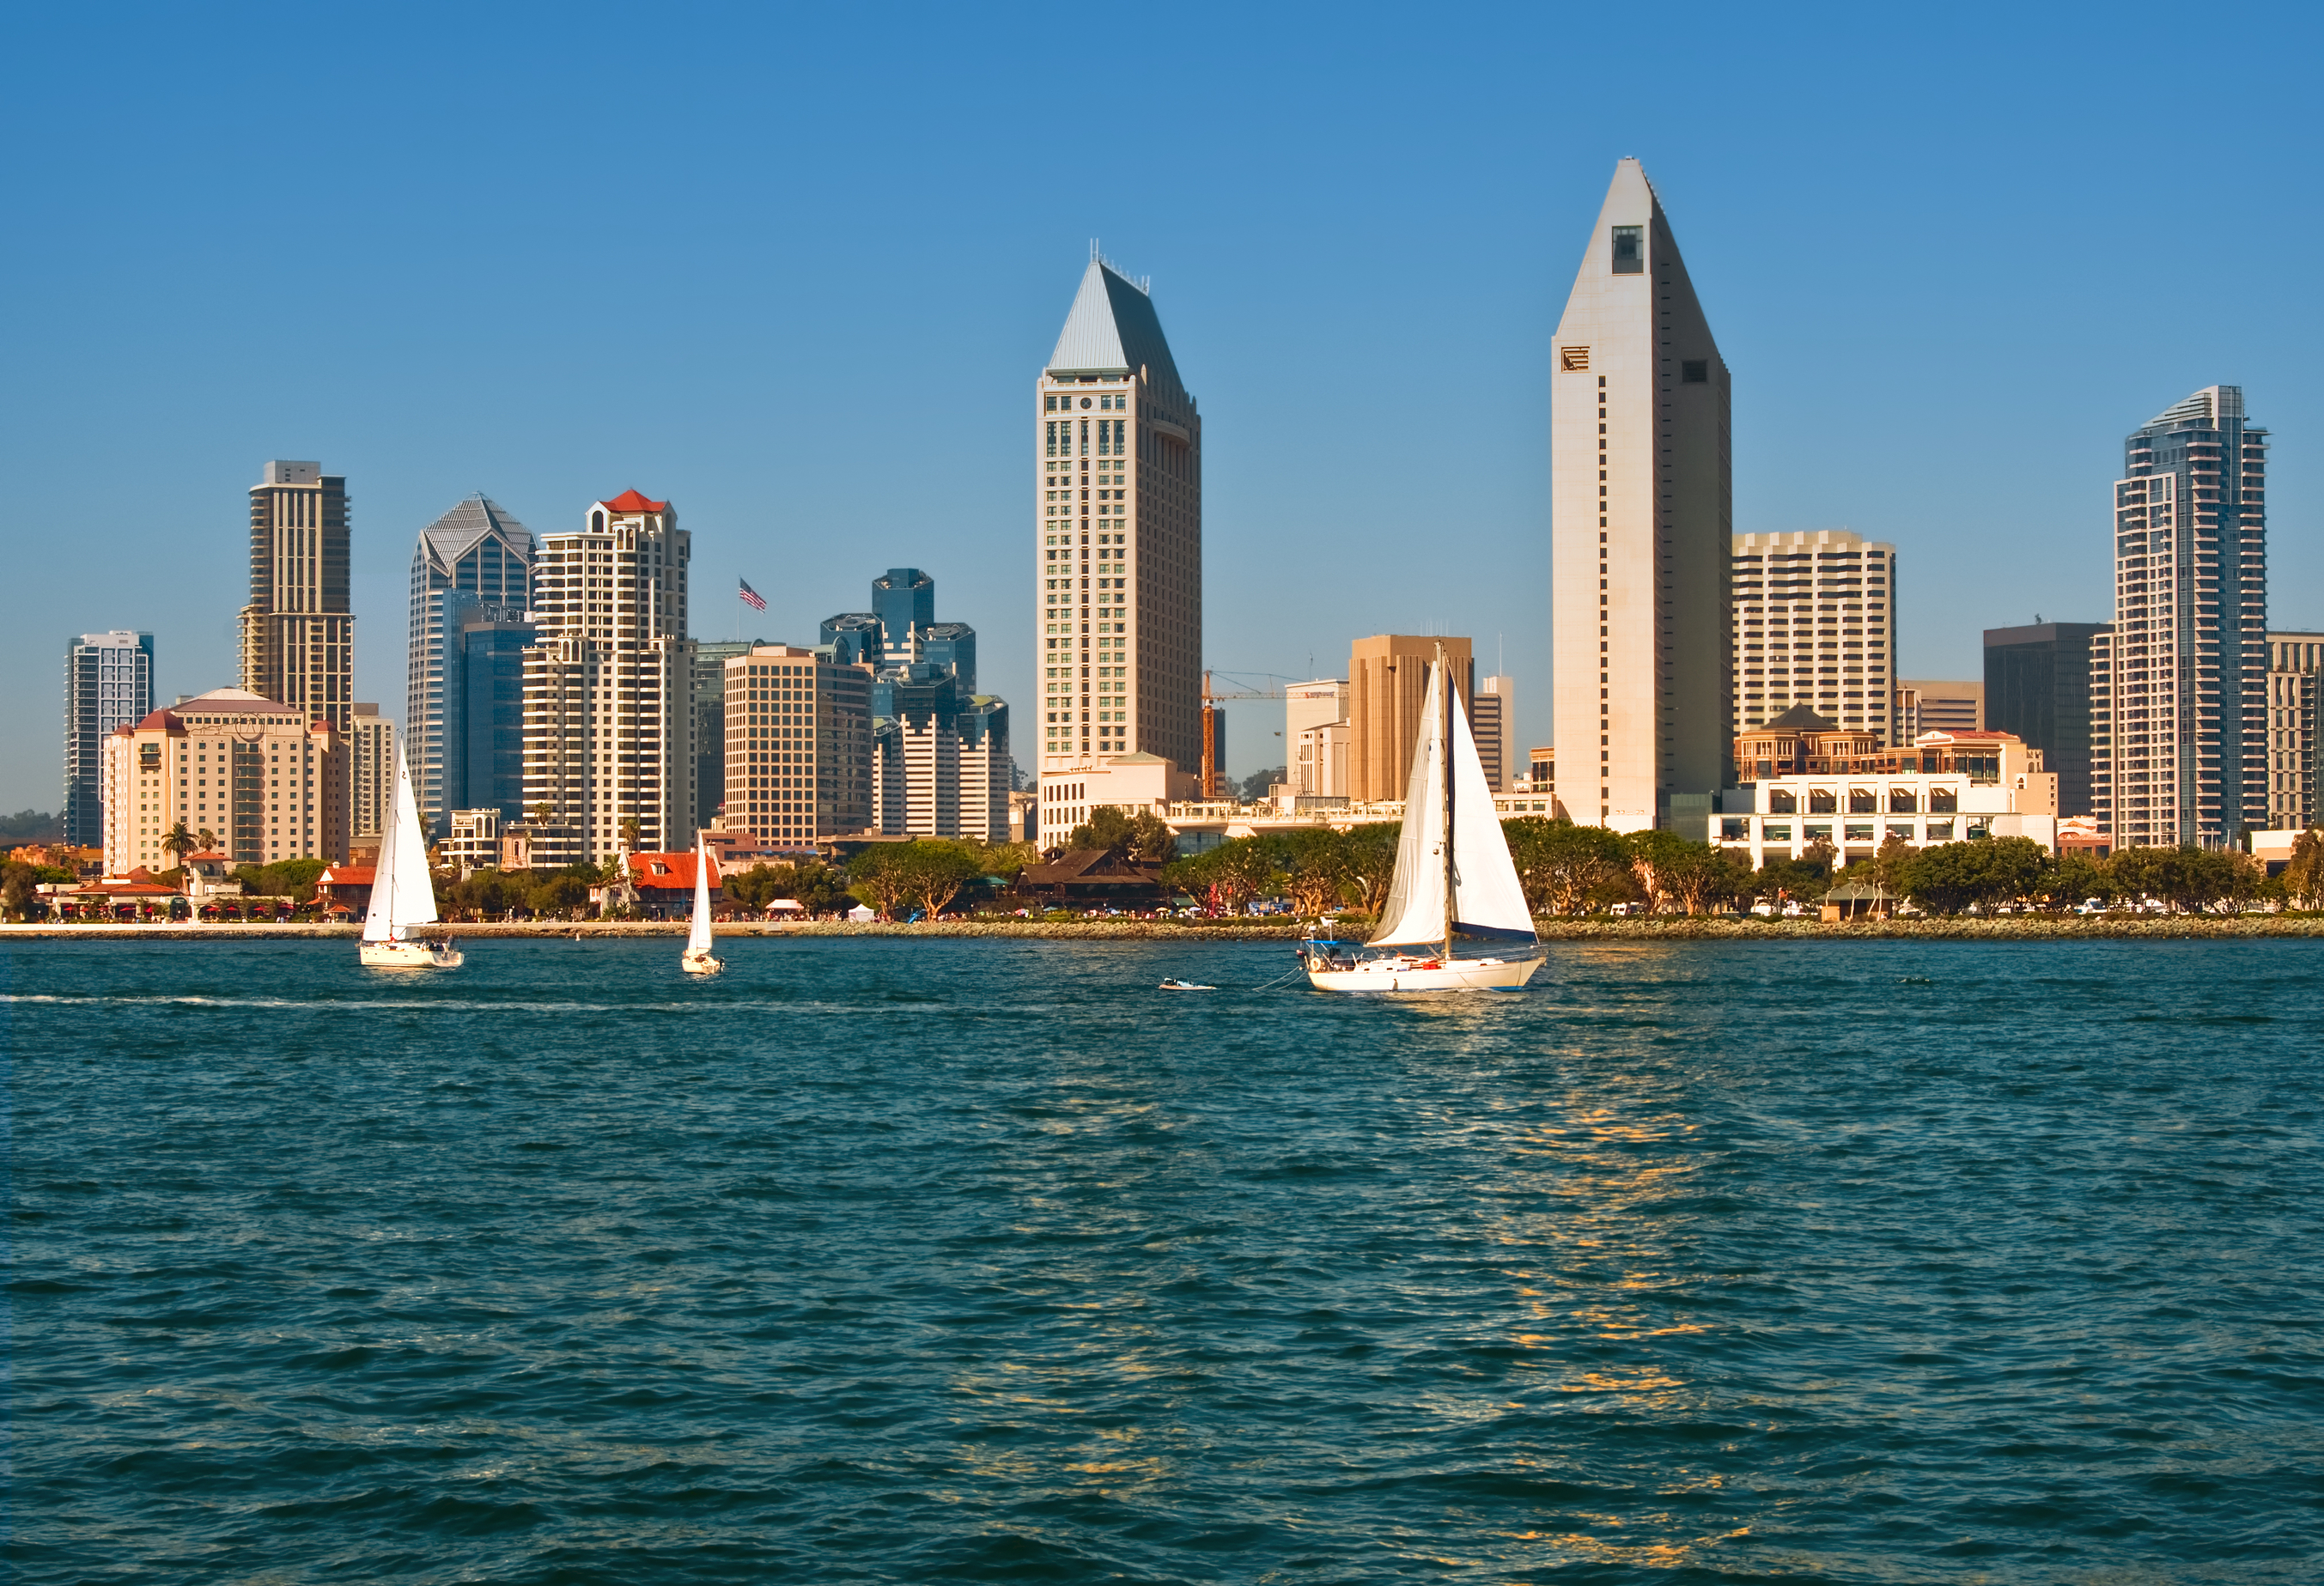 https://www.dreamstime.com/stock-image-san-diego-skyline-sailboats-california-image16024211